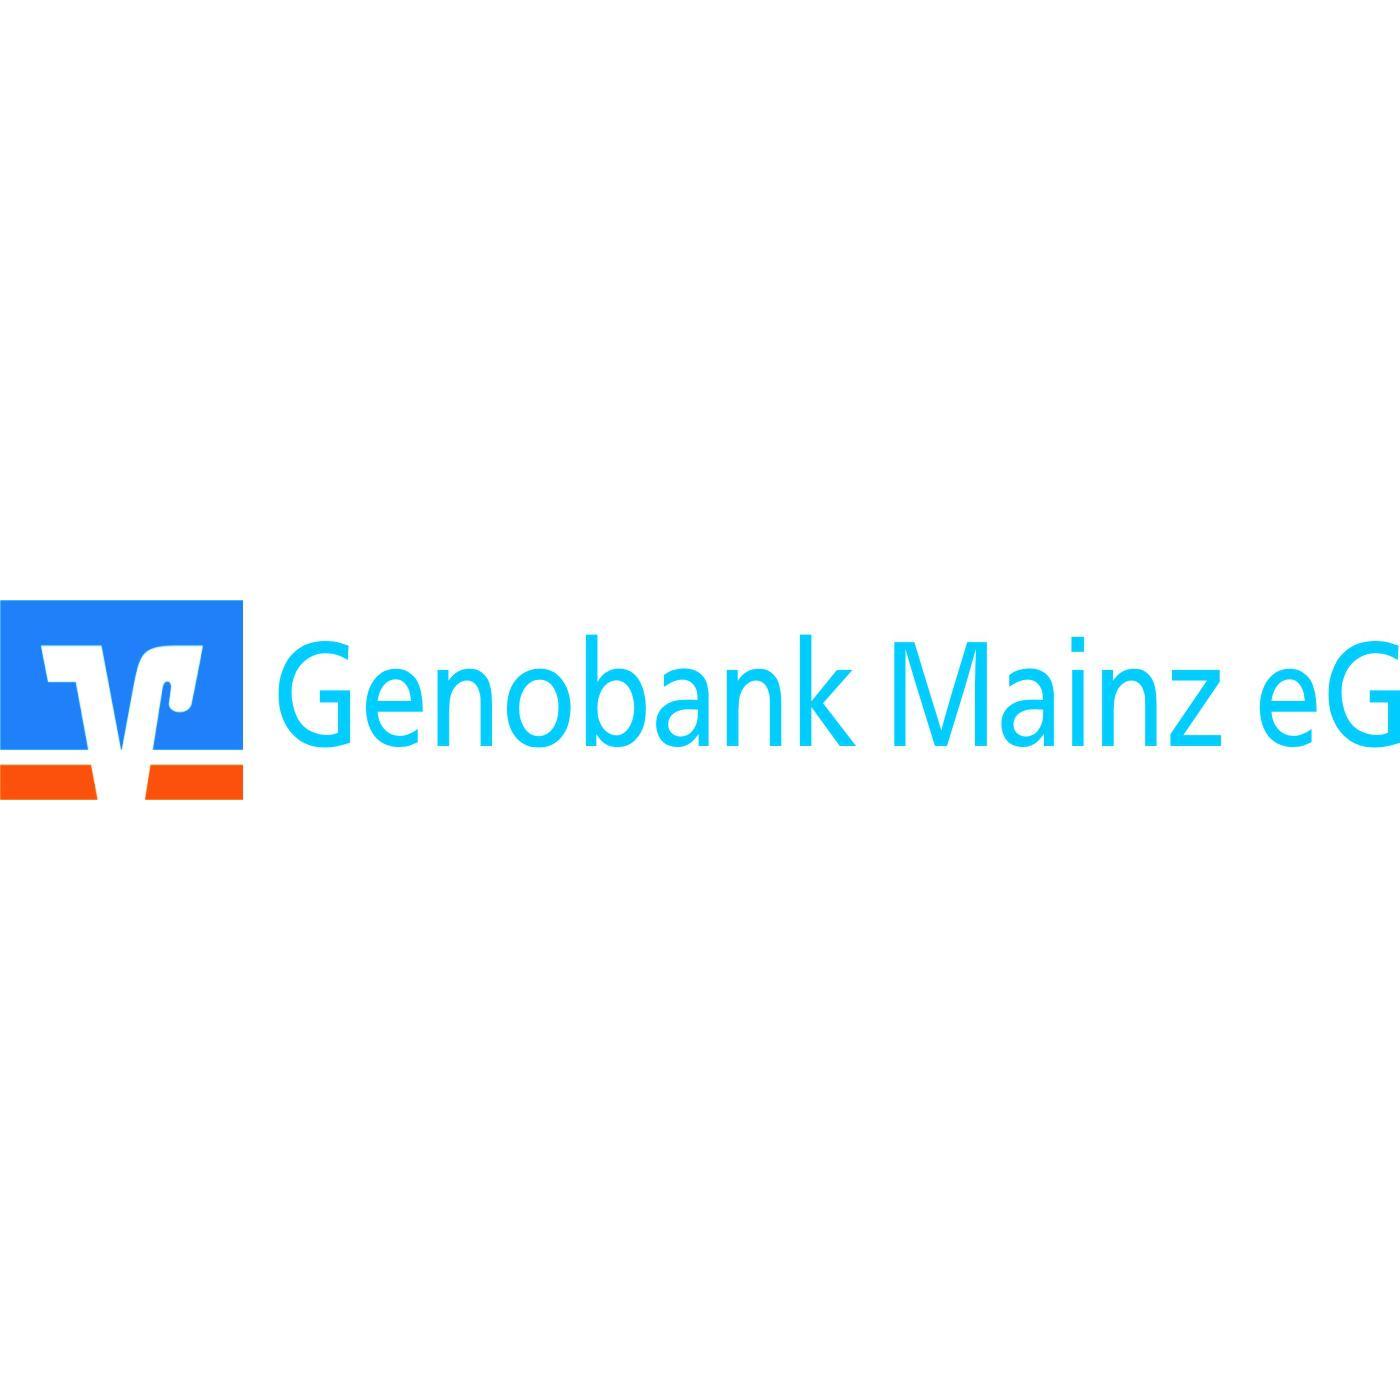 Genobank Mainz eG